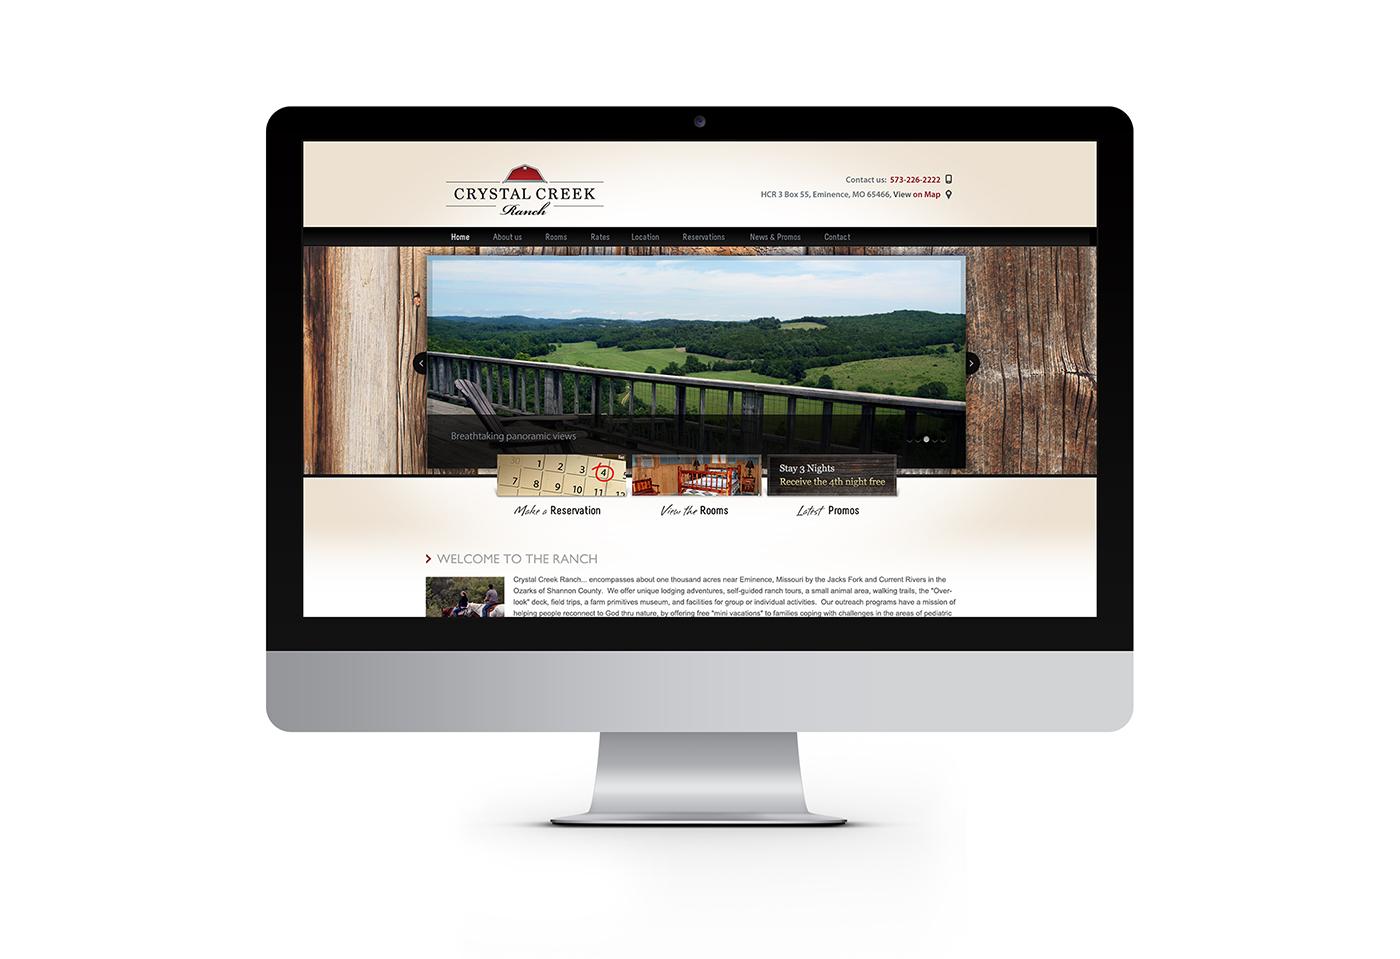 Crystal Creek Ranch website design